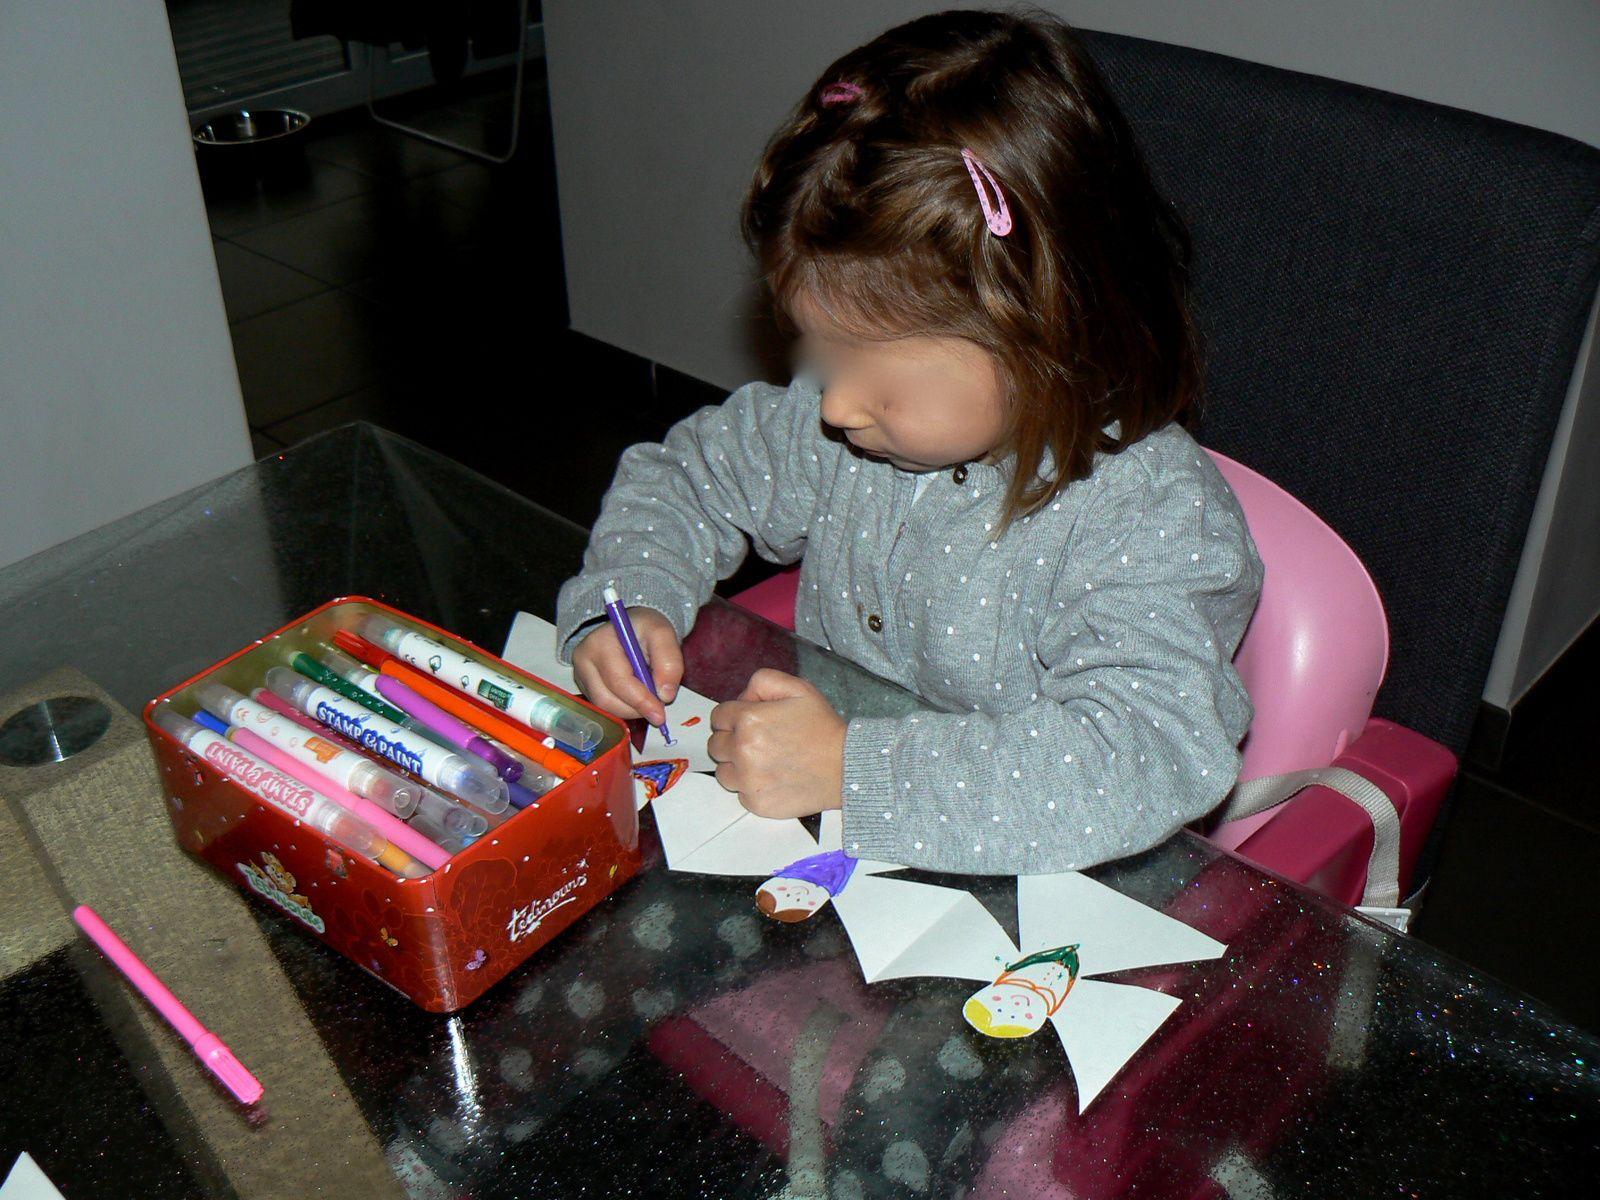 Décoration de Noël : de jolies guirlandes